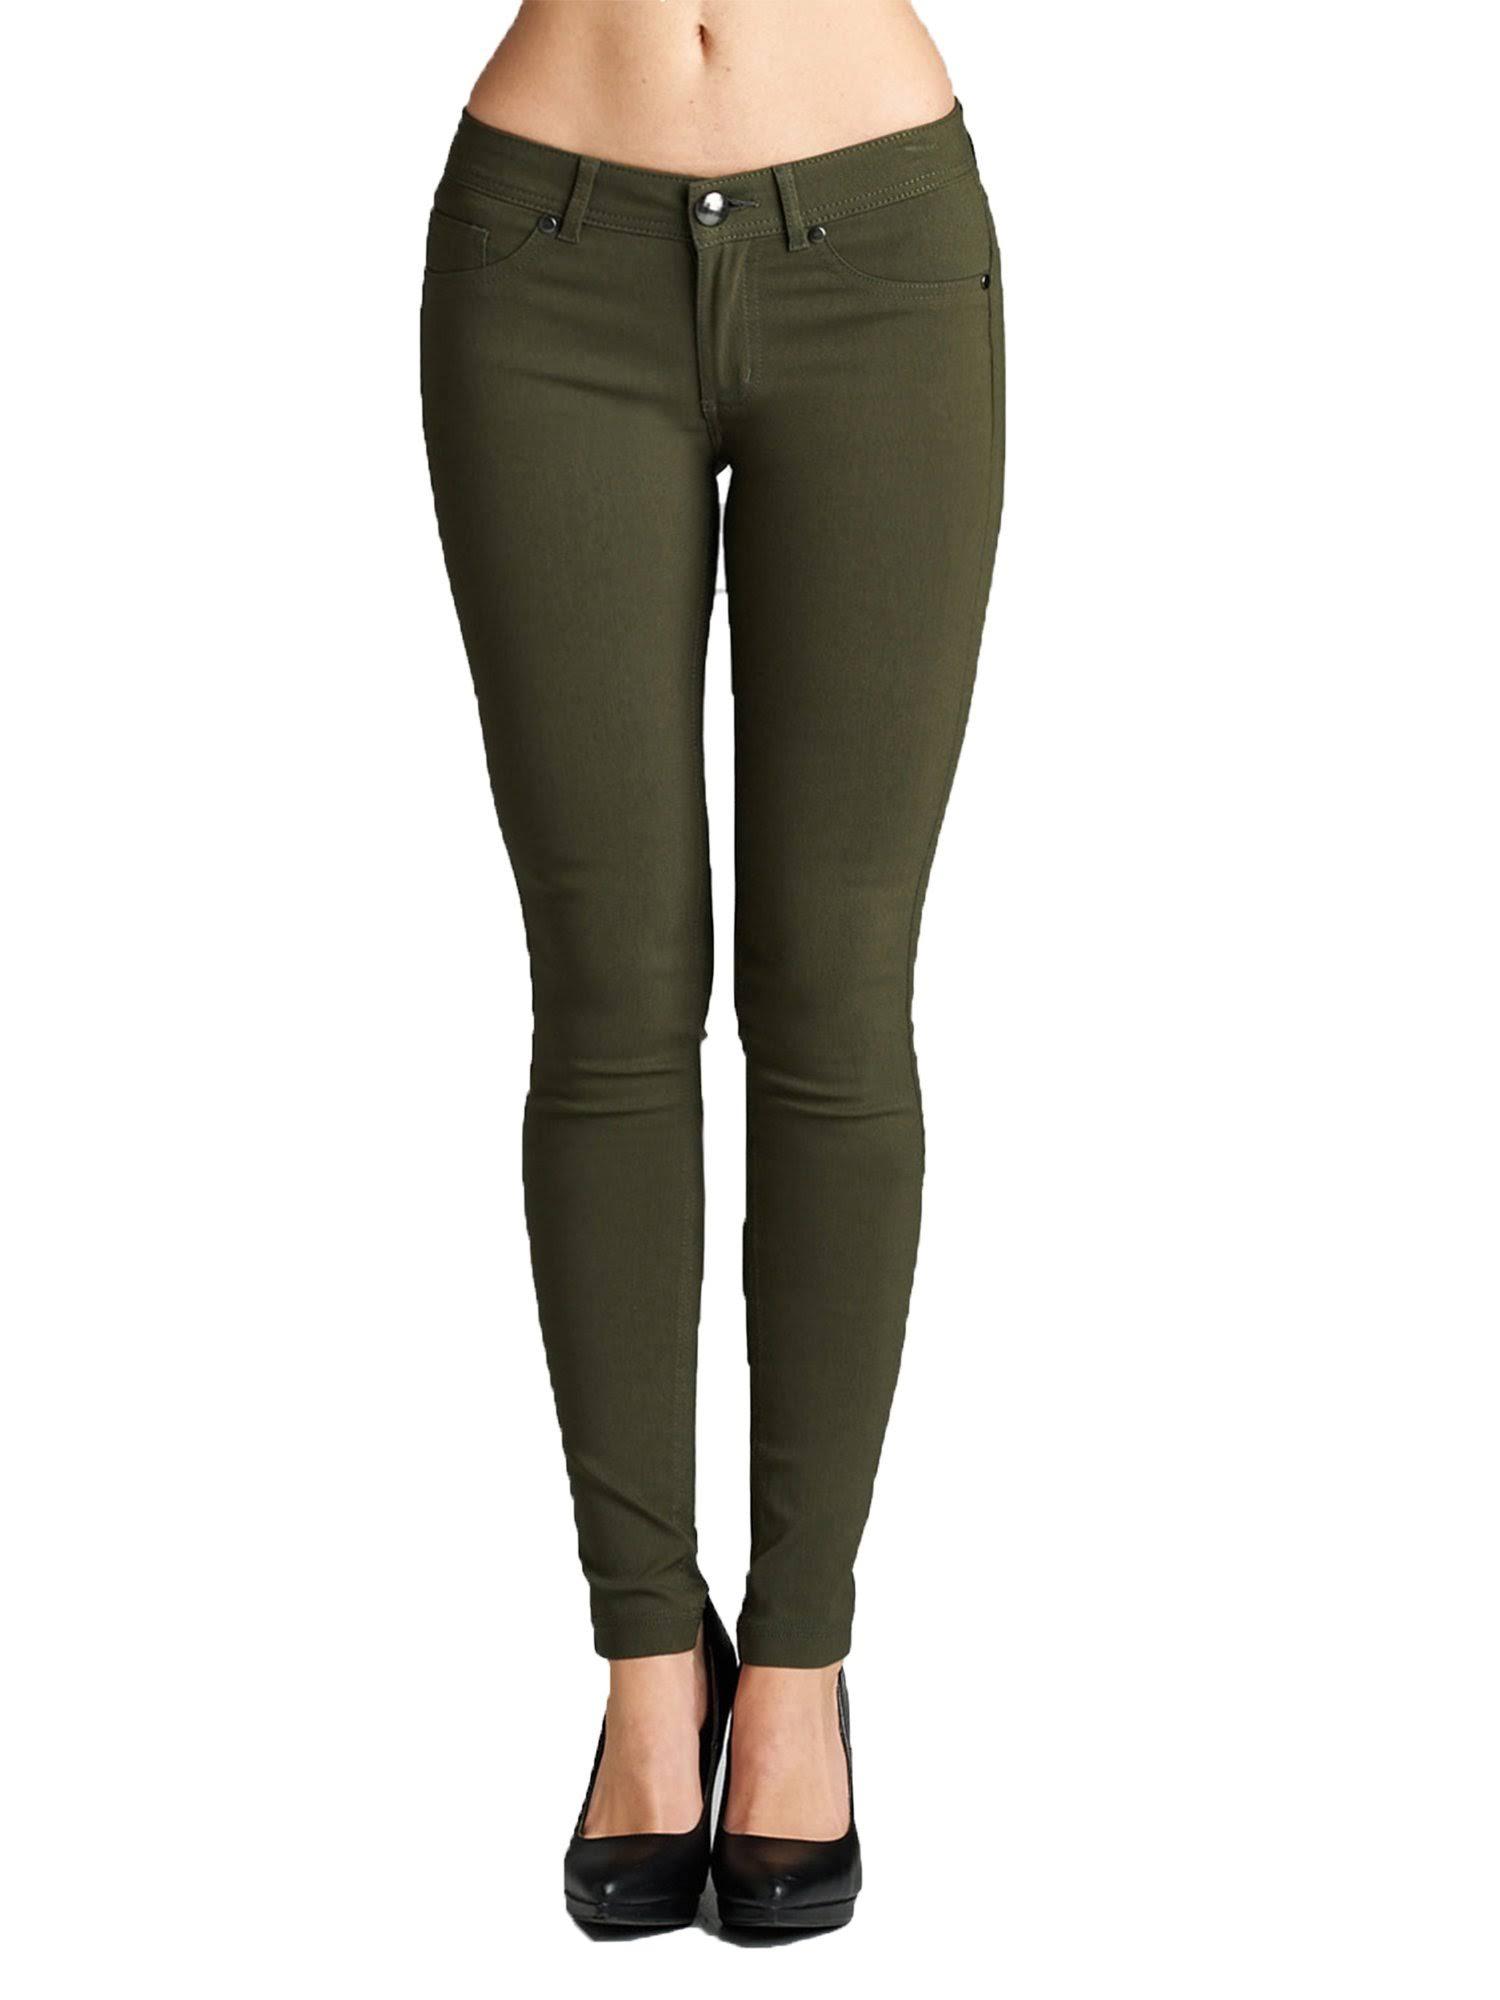 Bas Emmalise Basic Leggings Skinny Jeans En Jeggings De Femmes Collants Spandex Pour ppnr0Bq